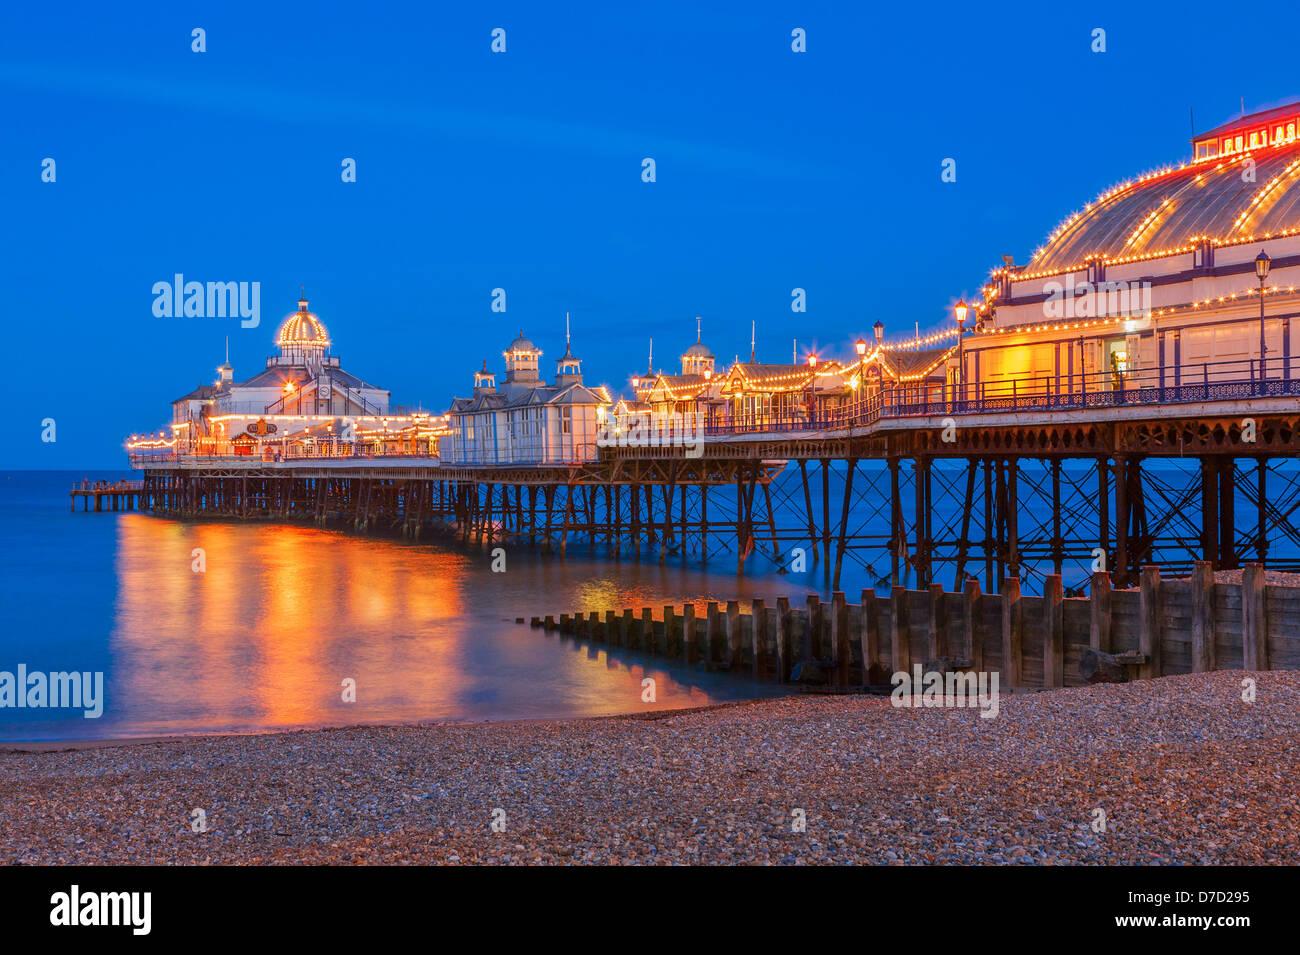 Eastbourne Pier accesa al crepuscolo Immagini Stock